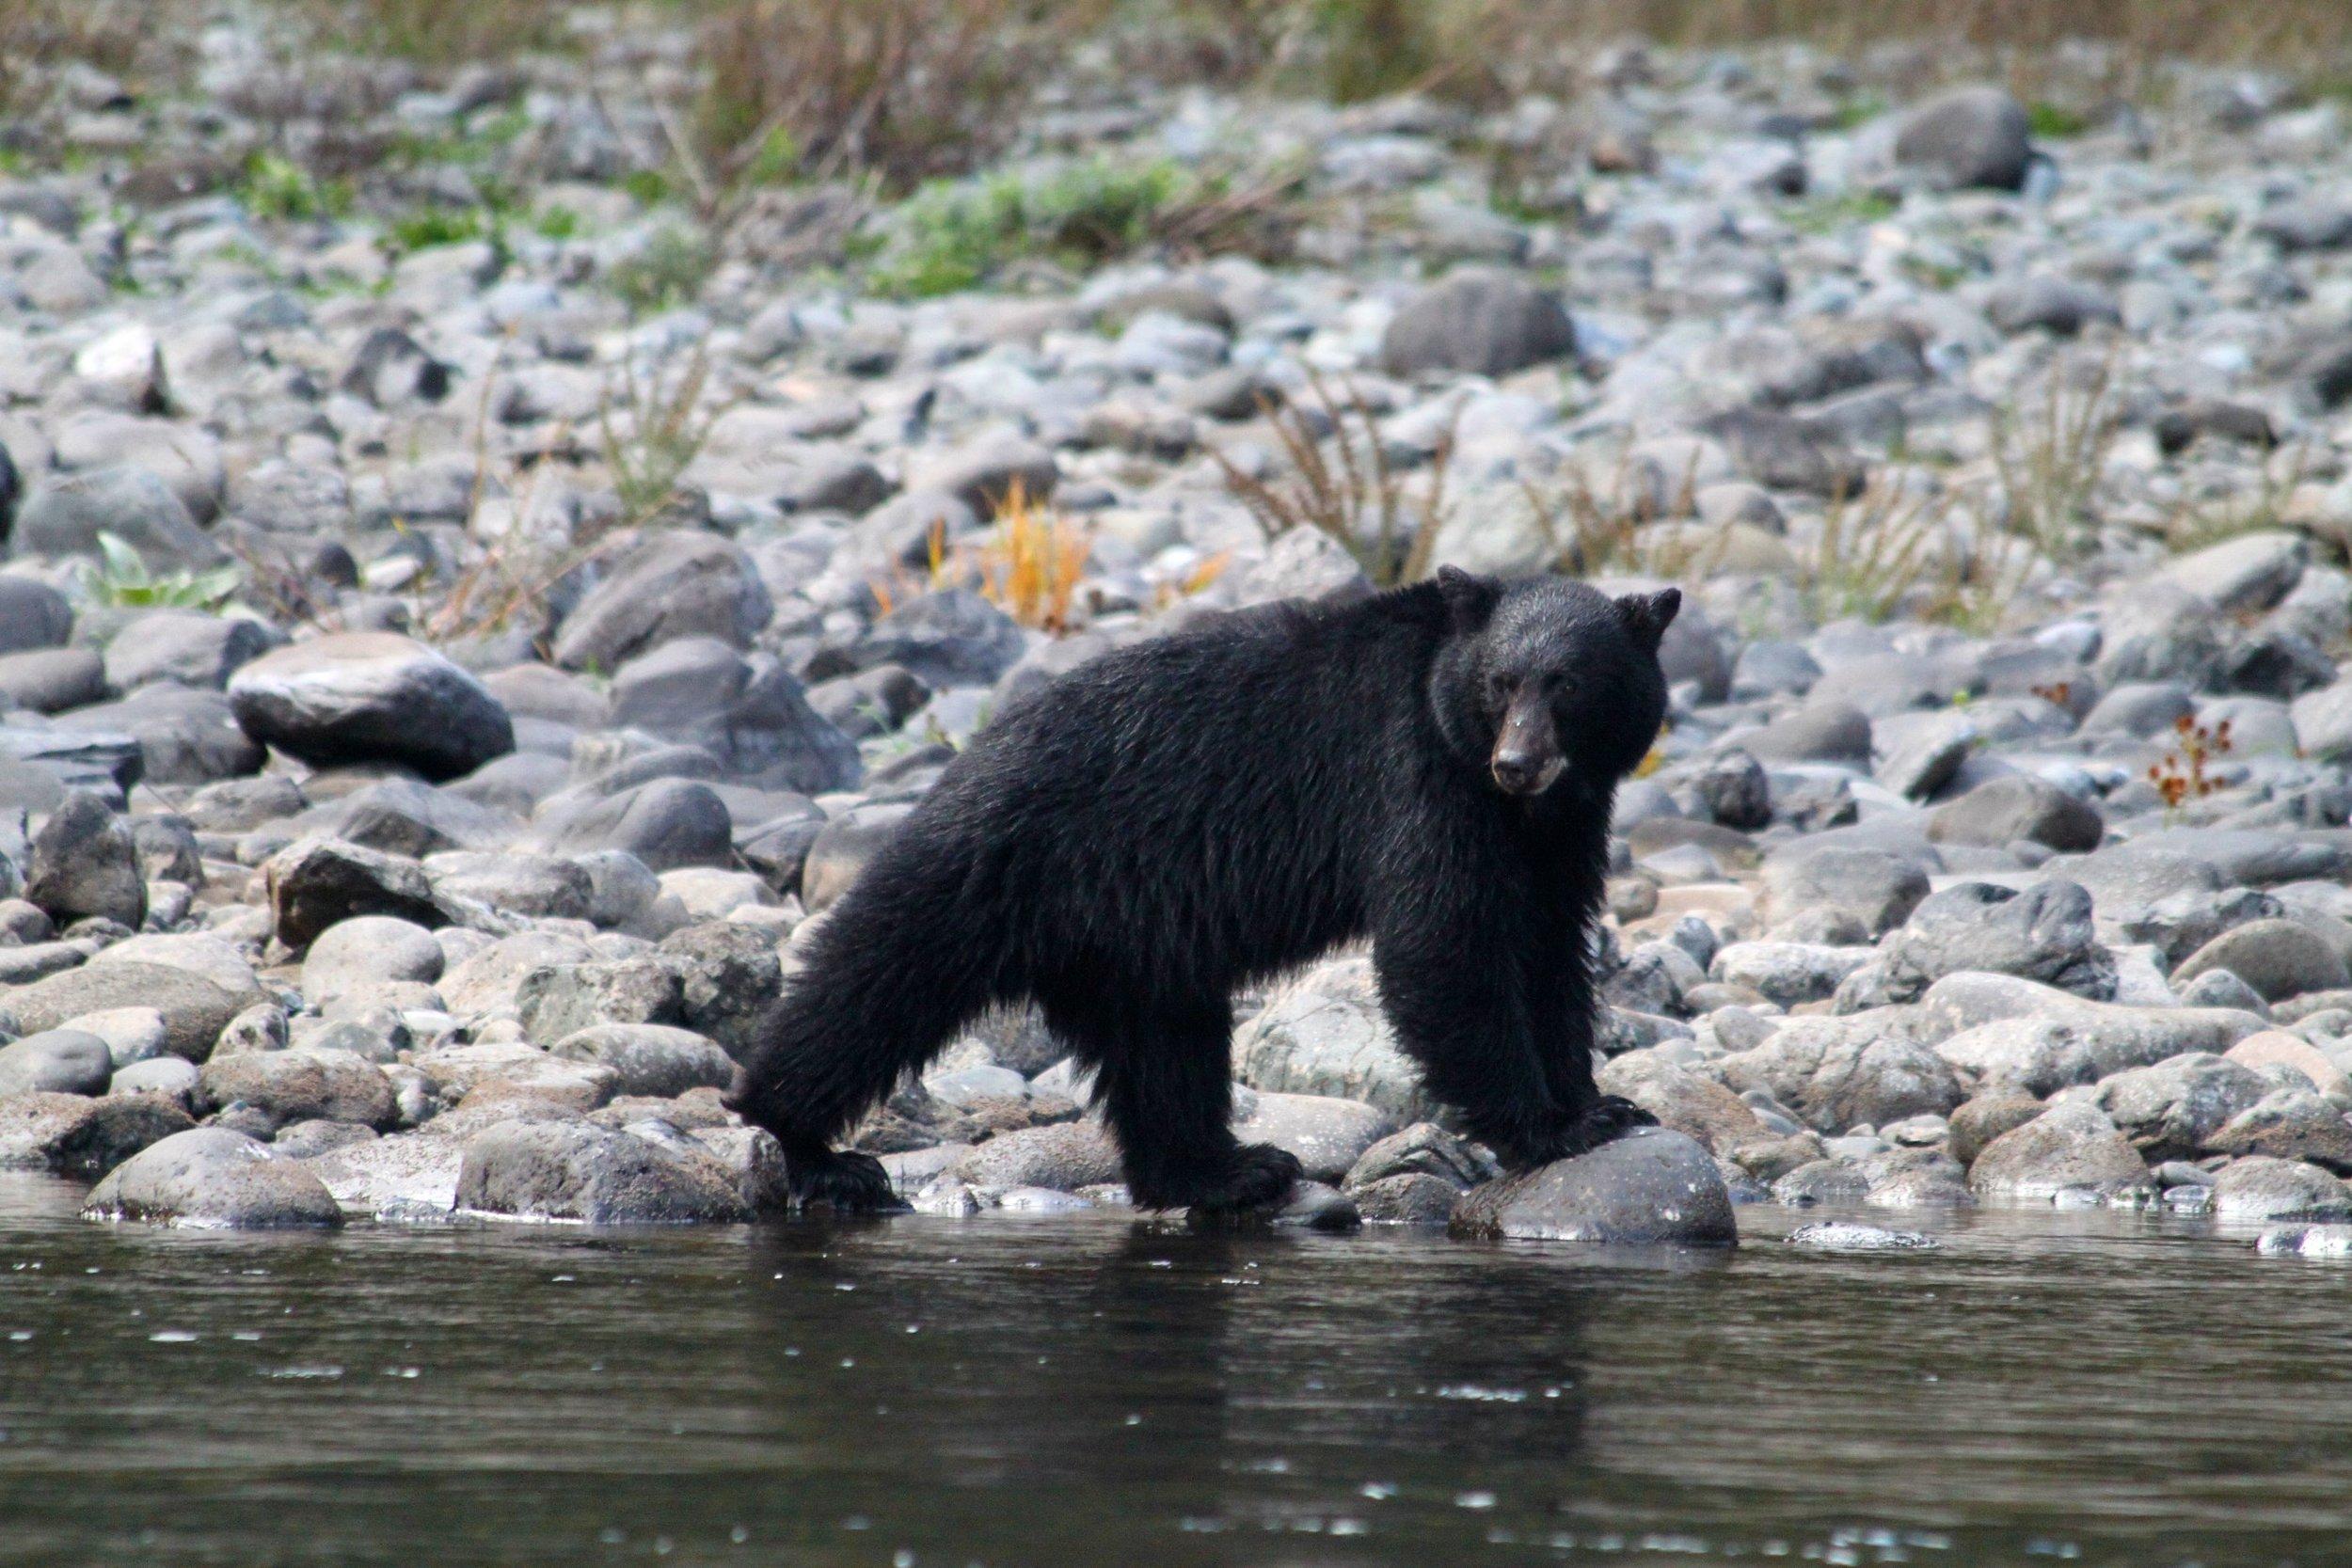 black-bear---rogue-river-rafting-trips---oregon_5375006718_o.jpg